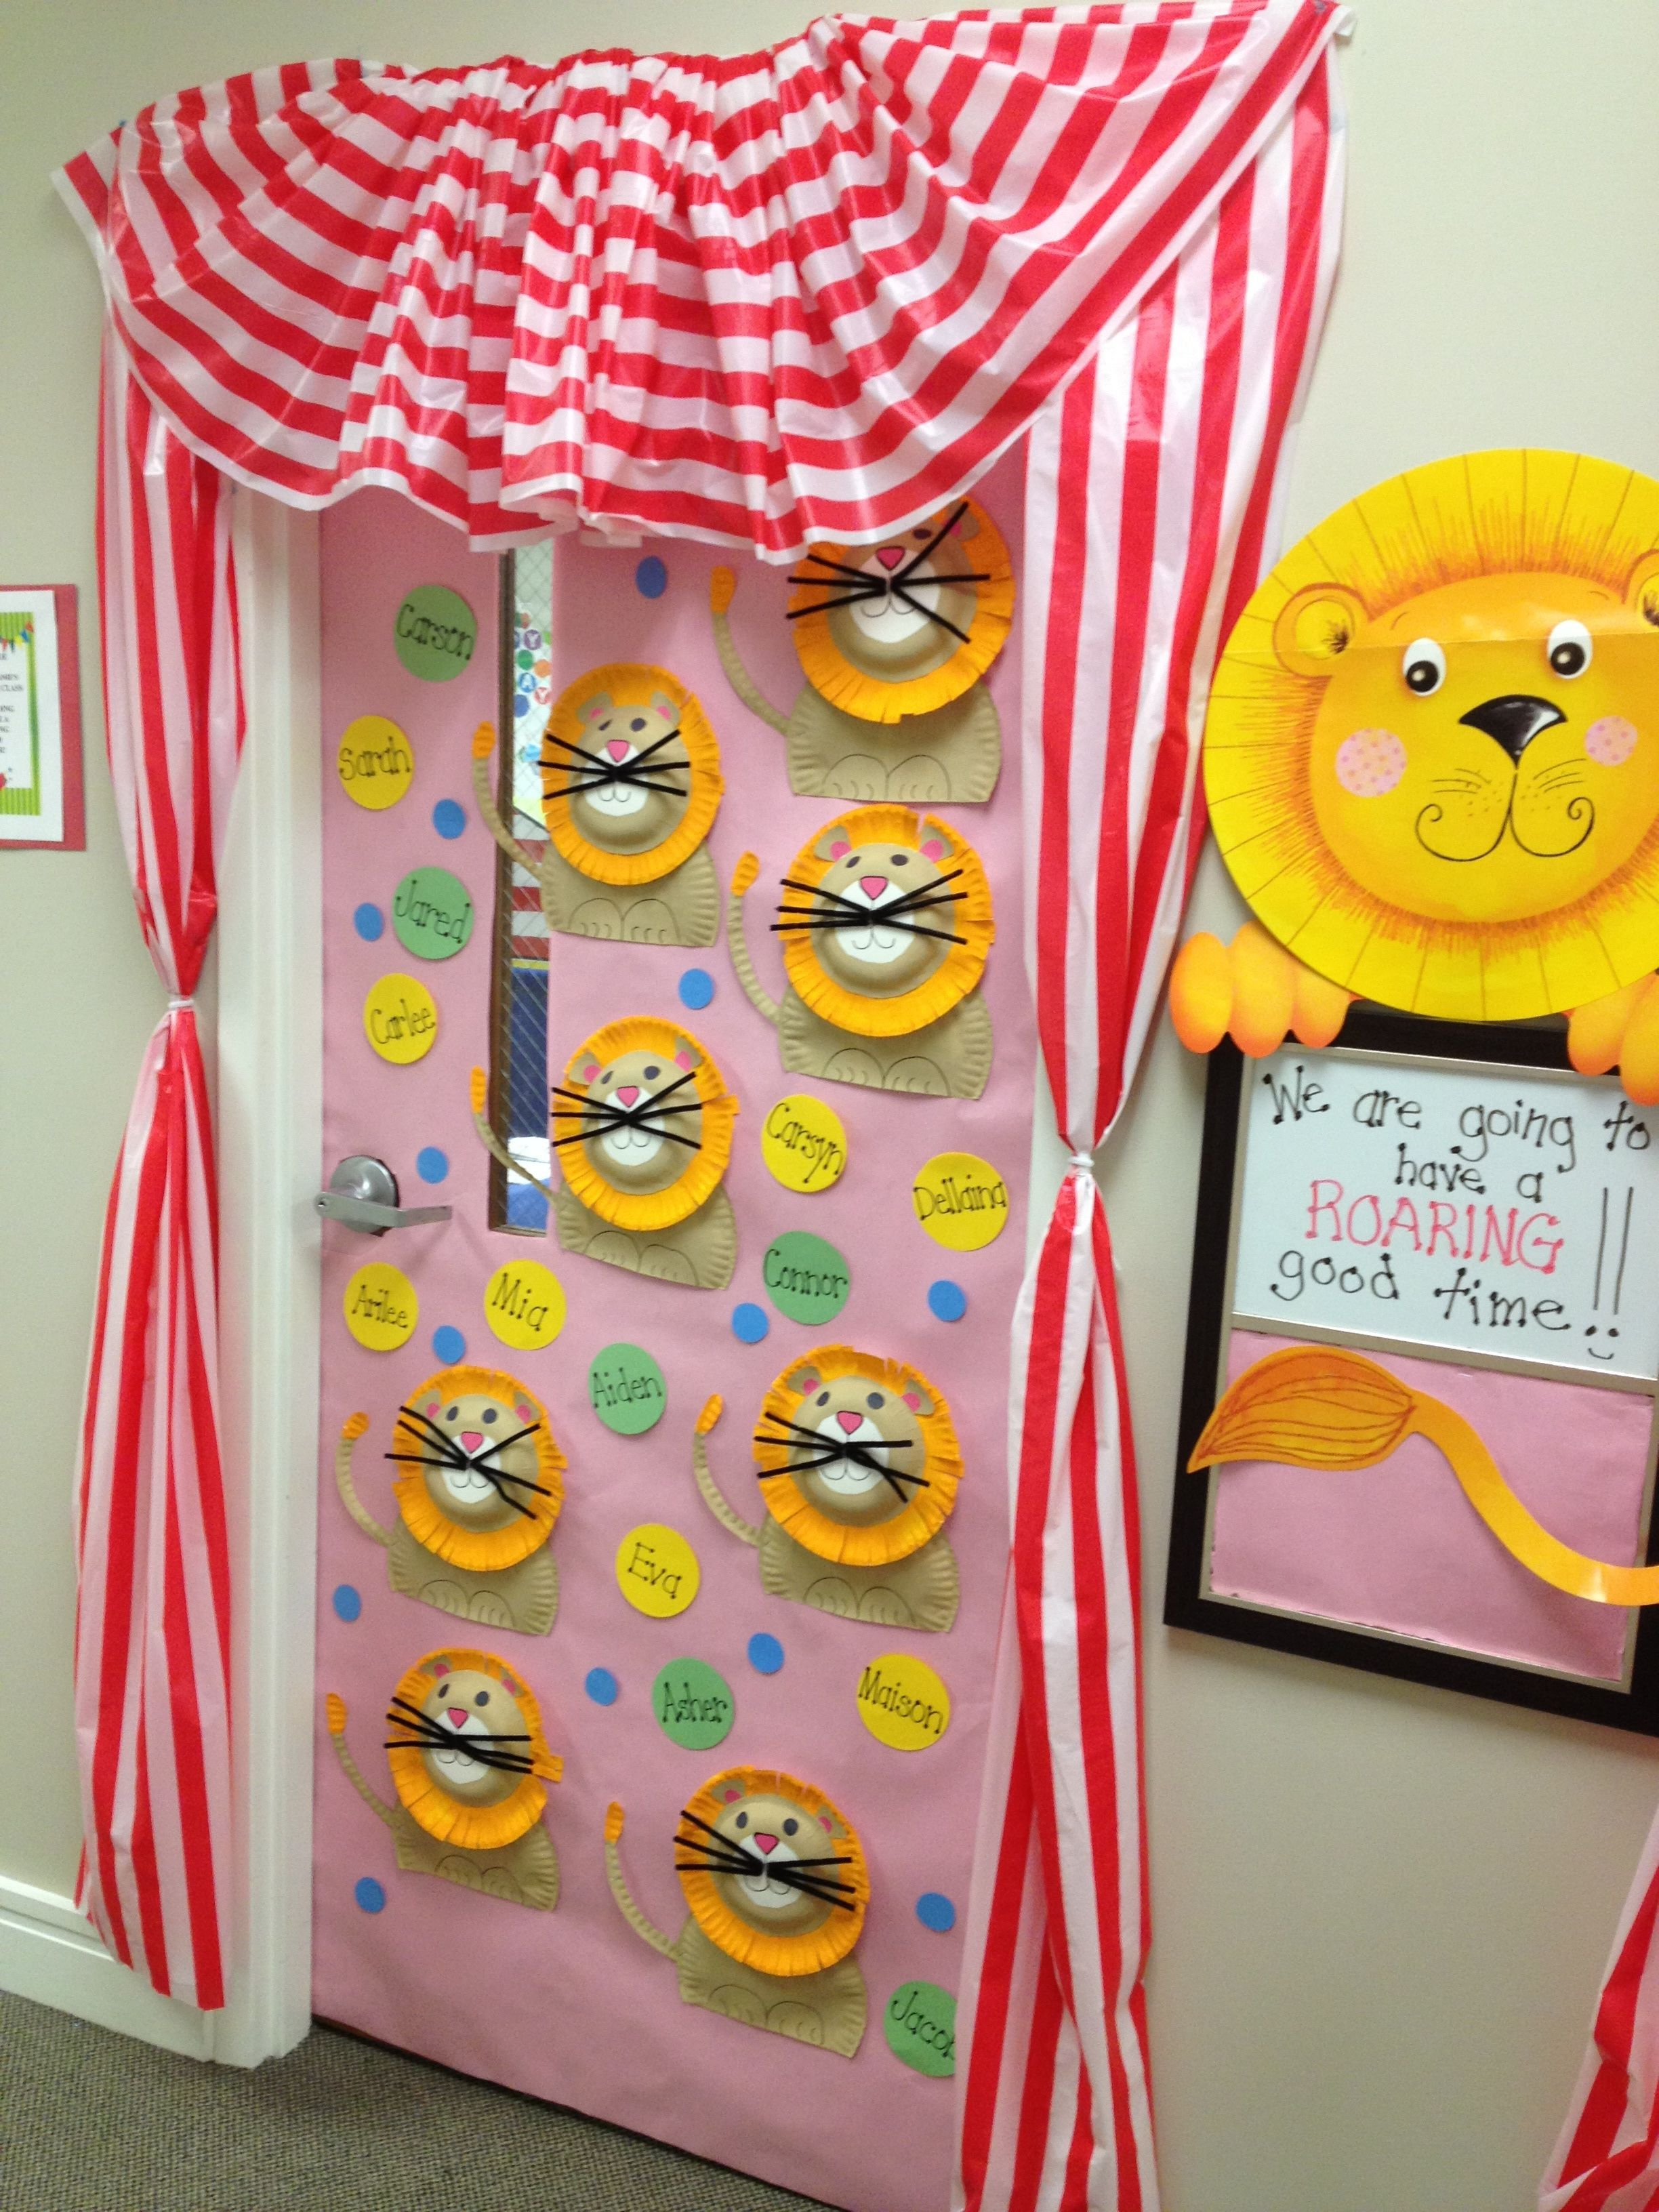 Back To School Carnival Theme At Temple Preschool New Bern Nc